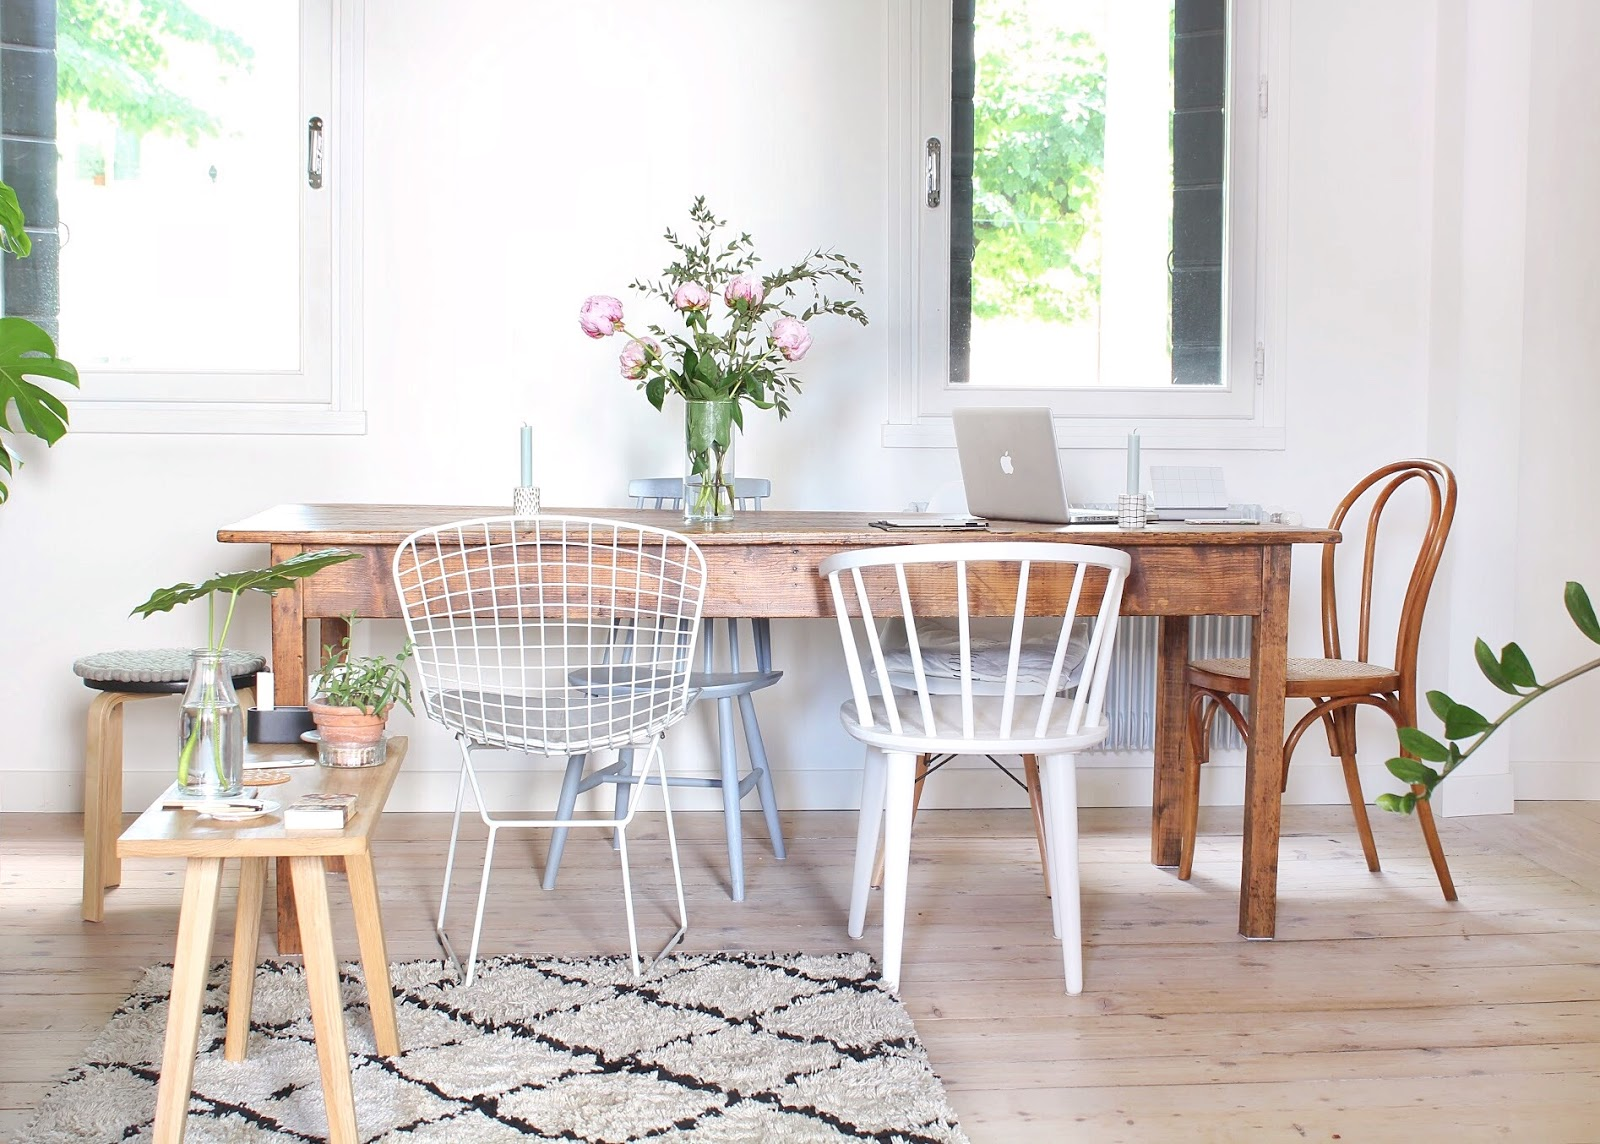 Di peonie, sedie vintage e bollitori